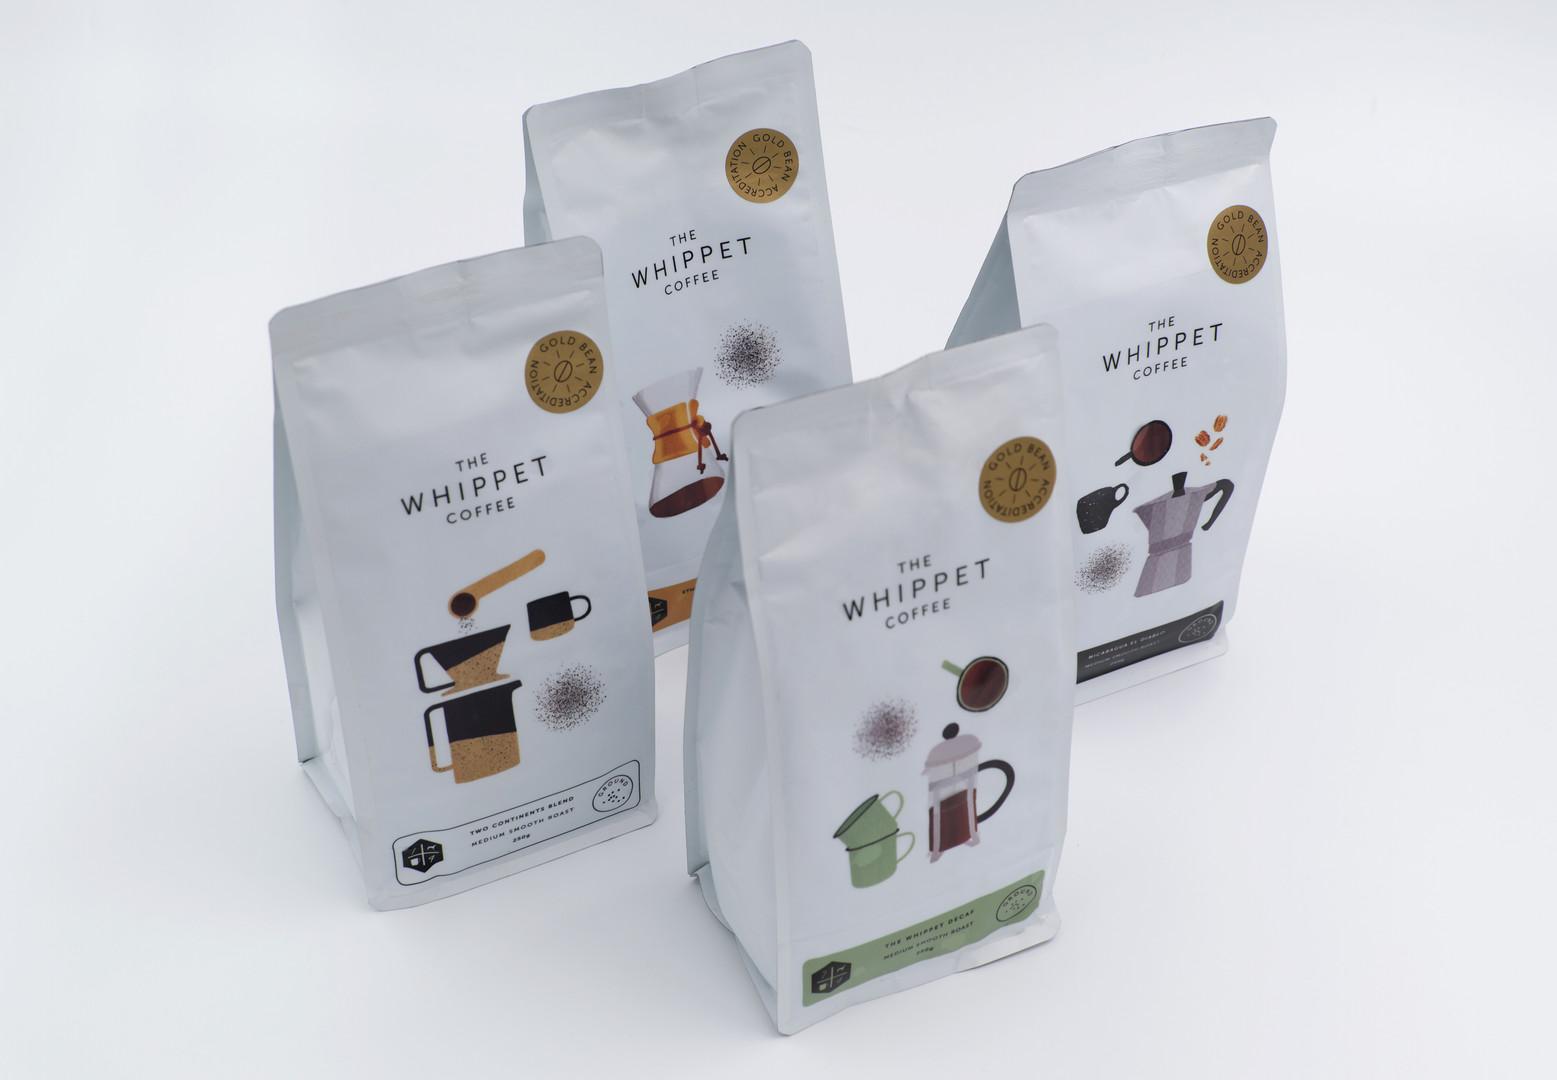 WHIPPET Coffee1_edited.jpg